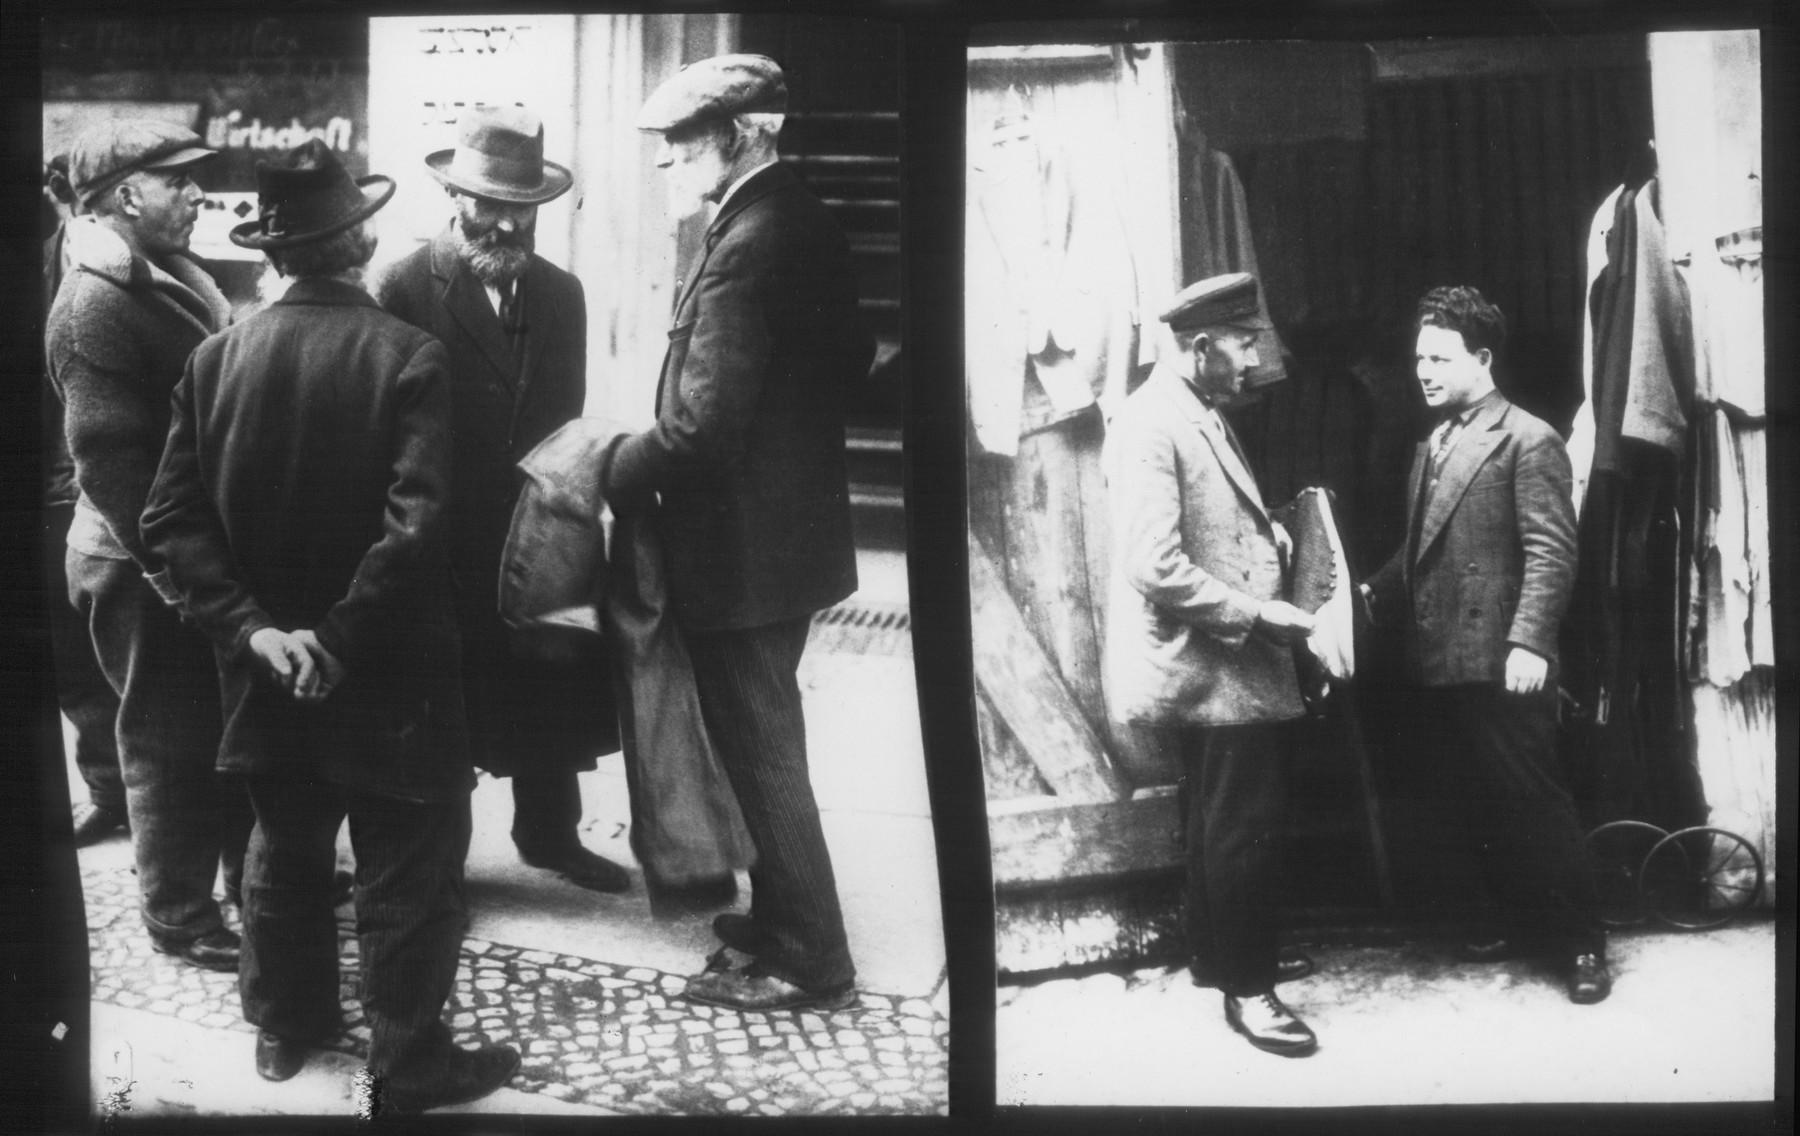 Untitled anti-Jewish propaganda slide featuring two scenes of Jews in the Berlin Jewish quarter.